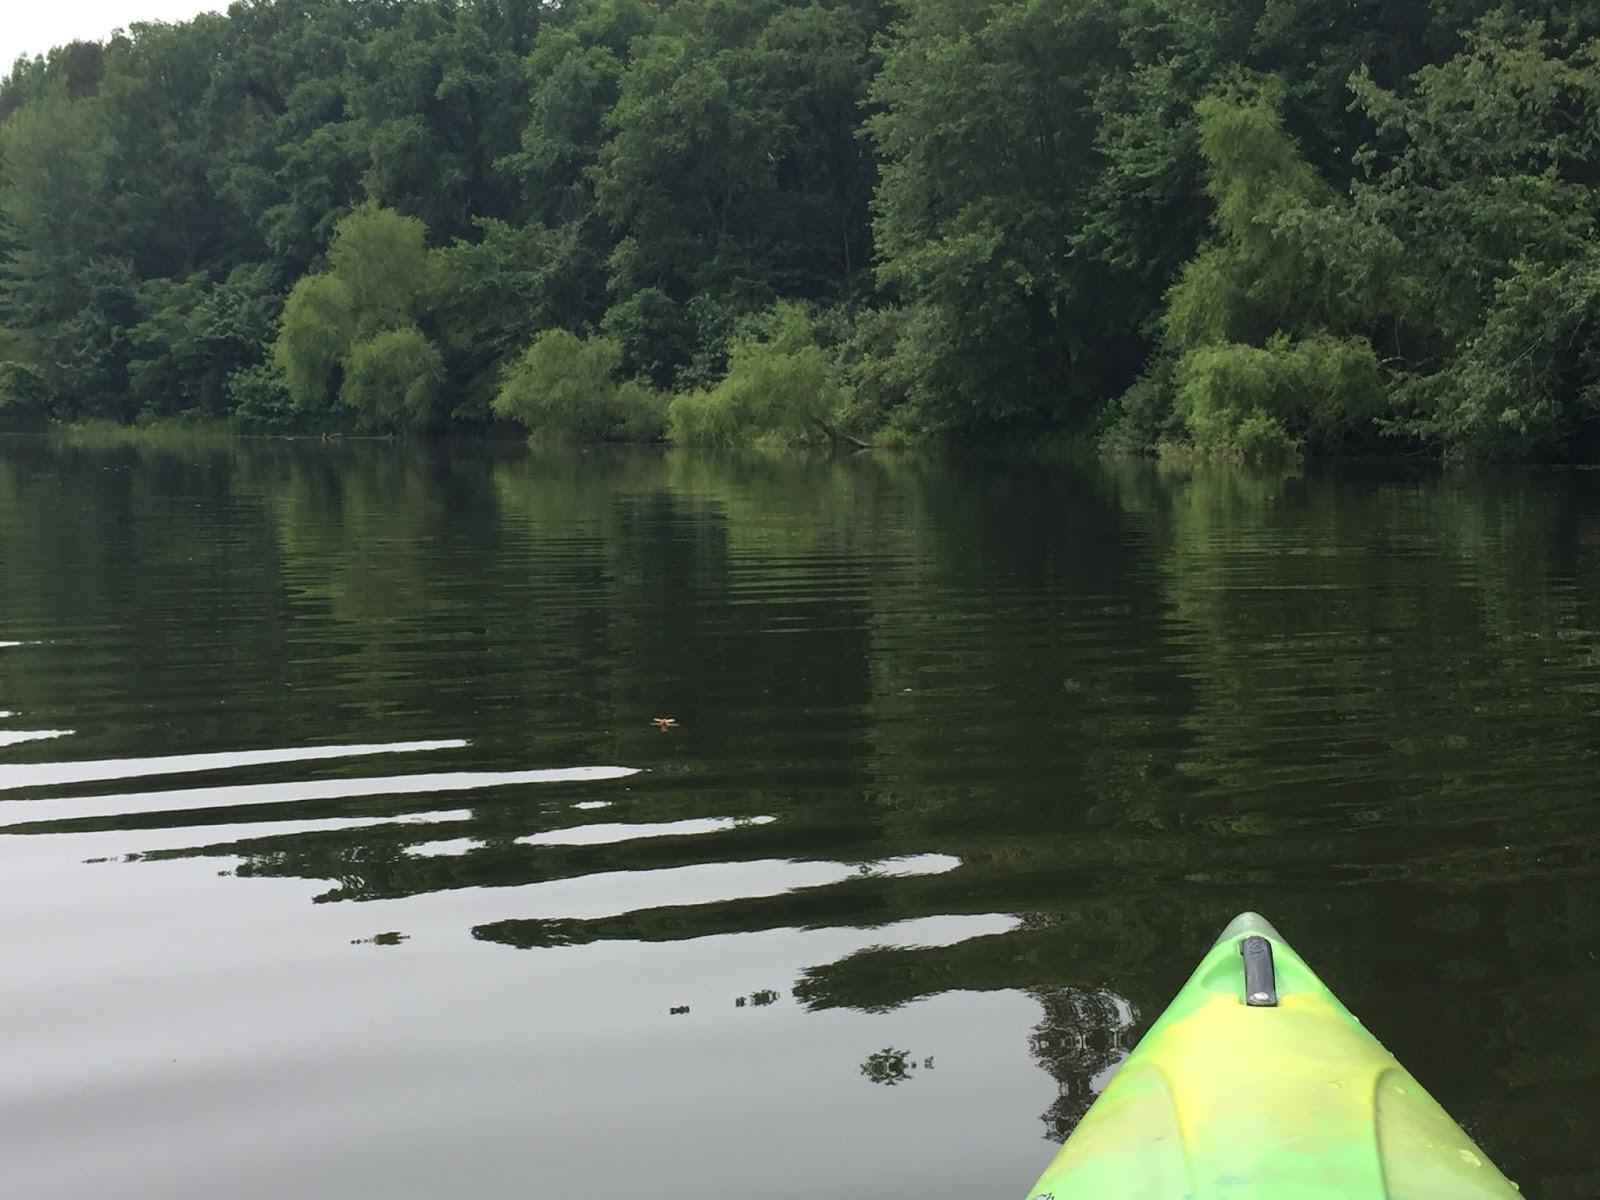 Lake Snowden | Athens County Visitor's Bureau